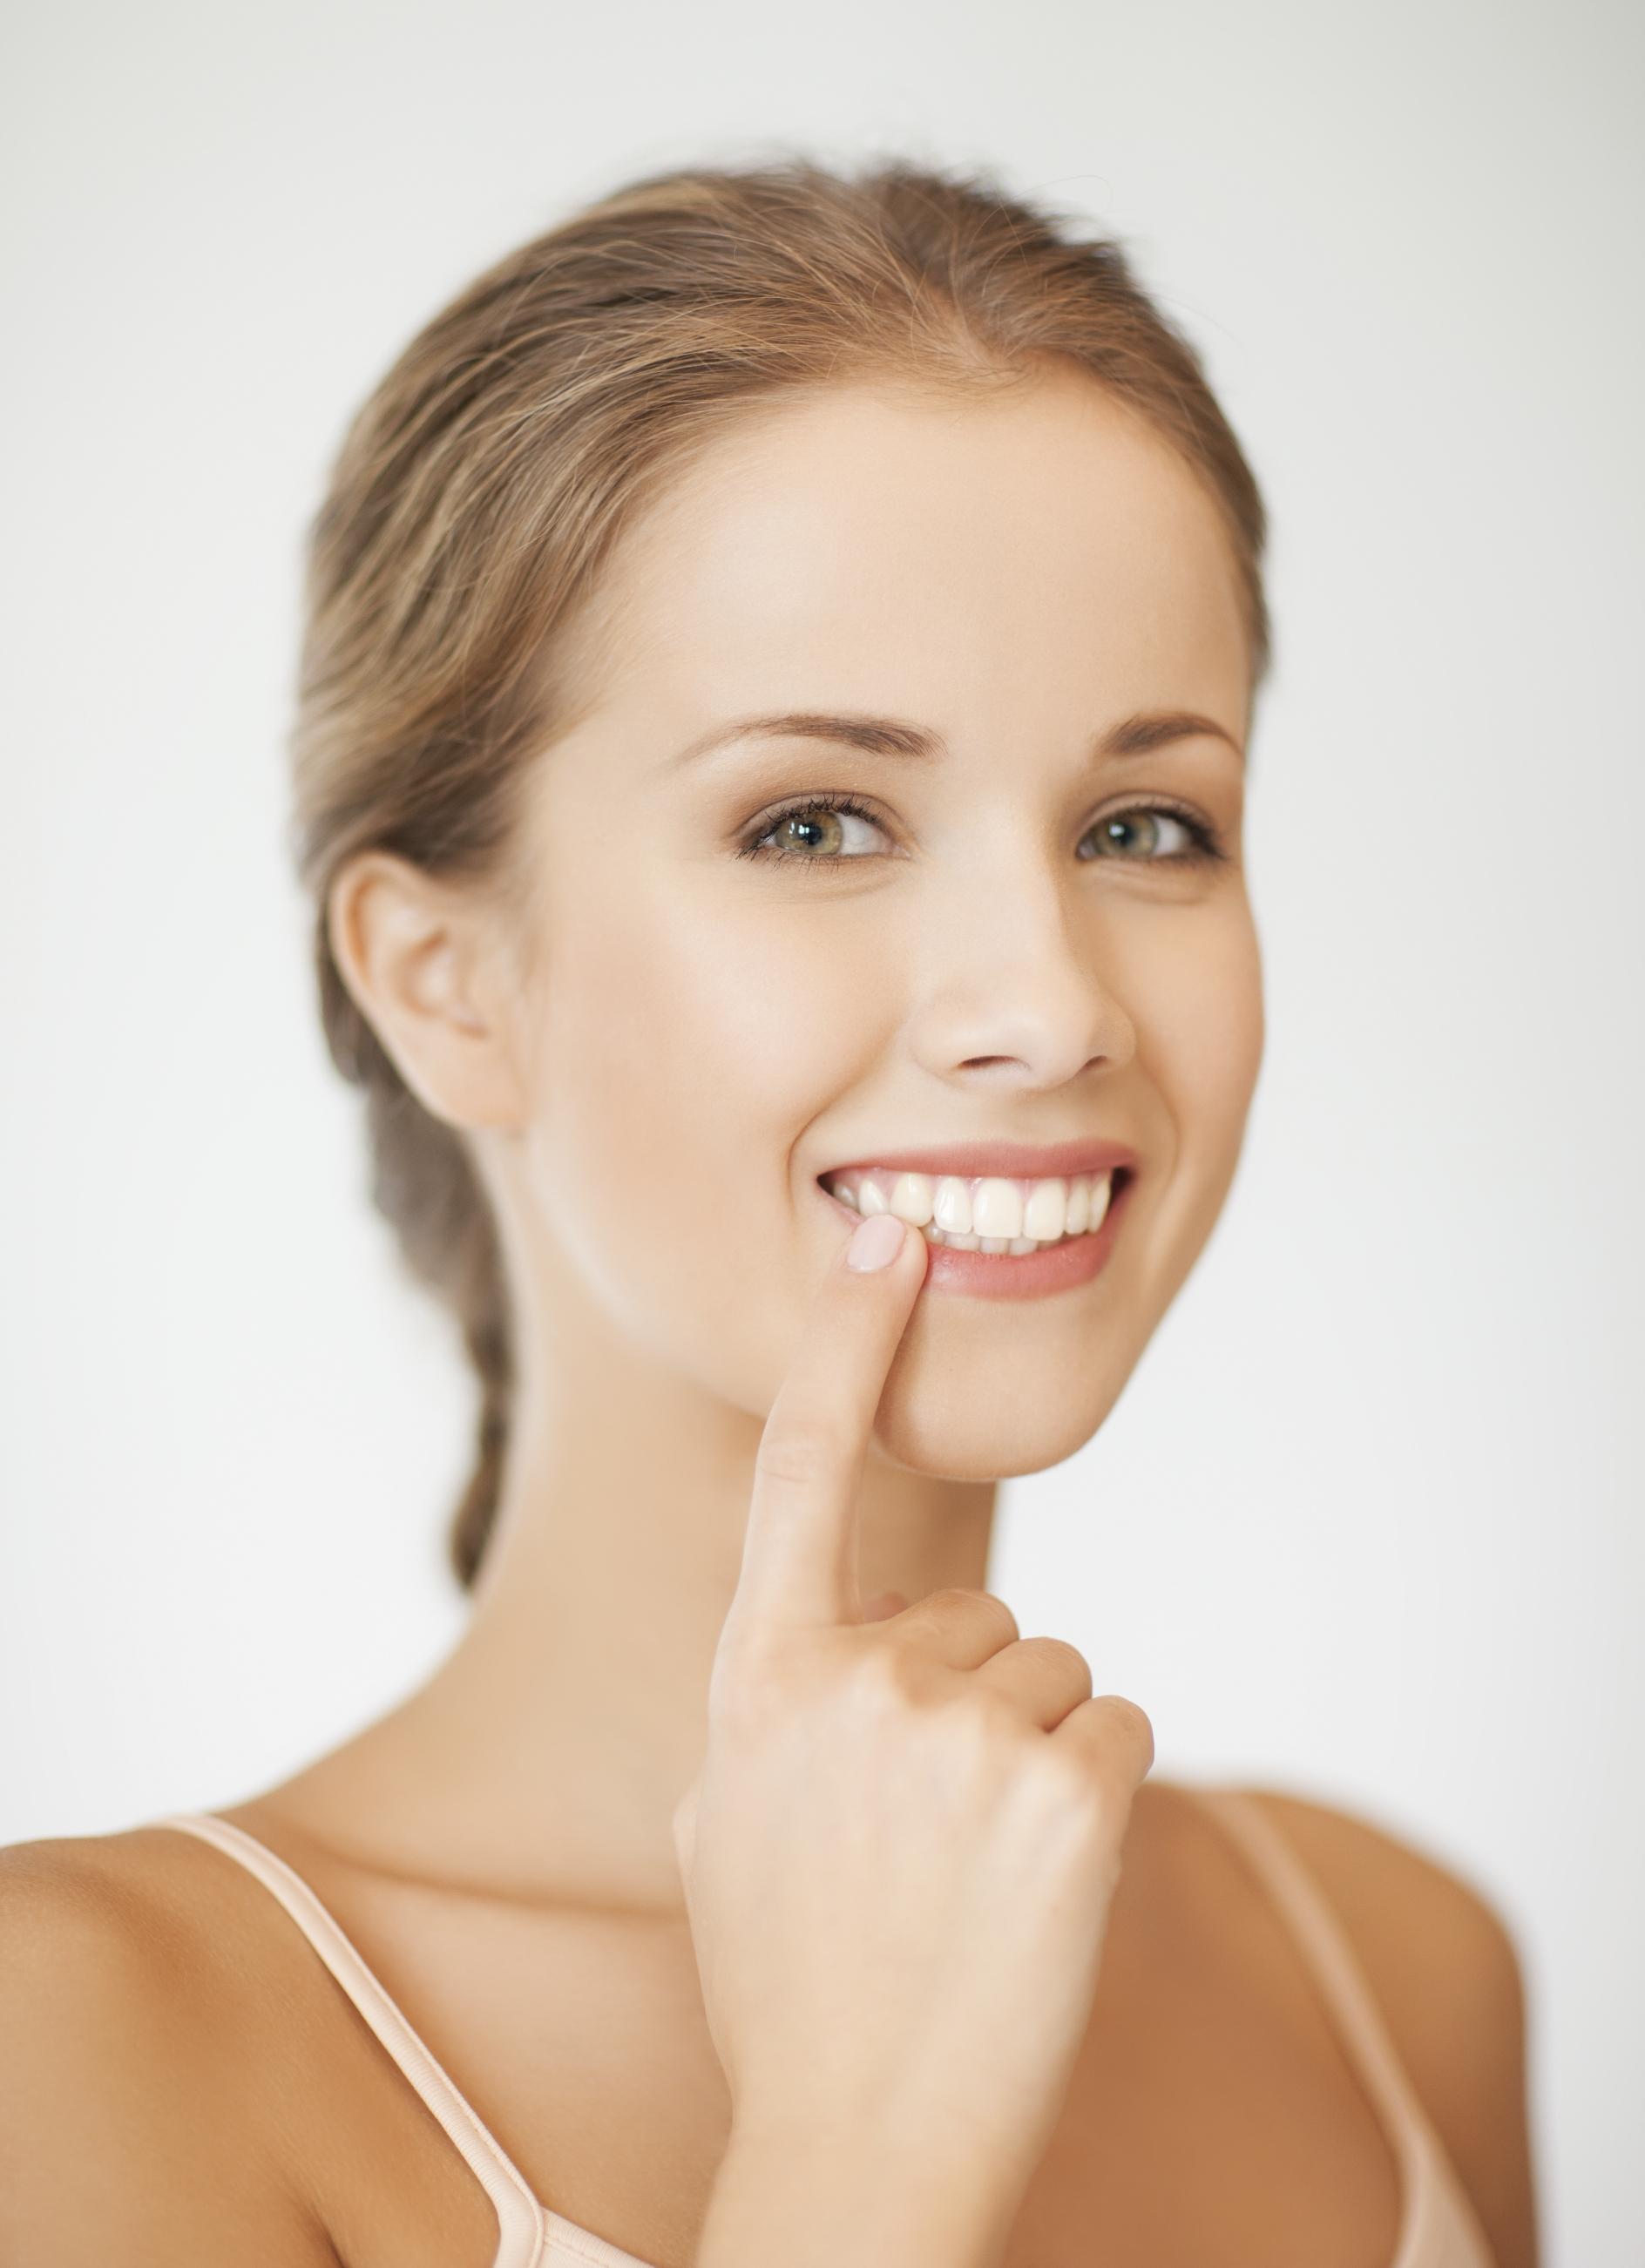 Teeth Whitening | Ridgeview Family Dental | Warrensburg, MO